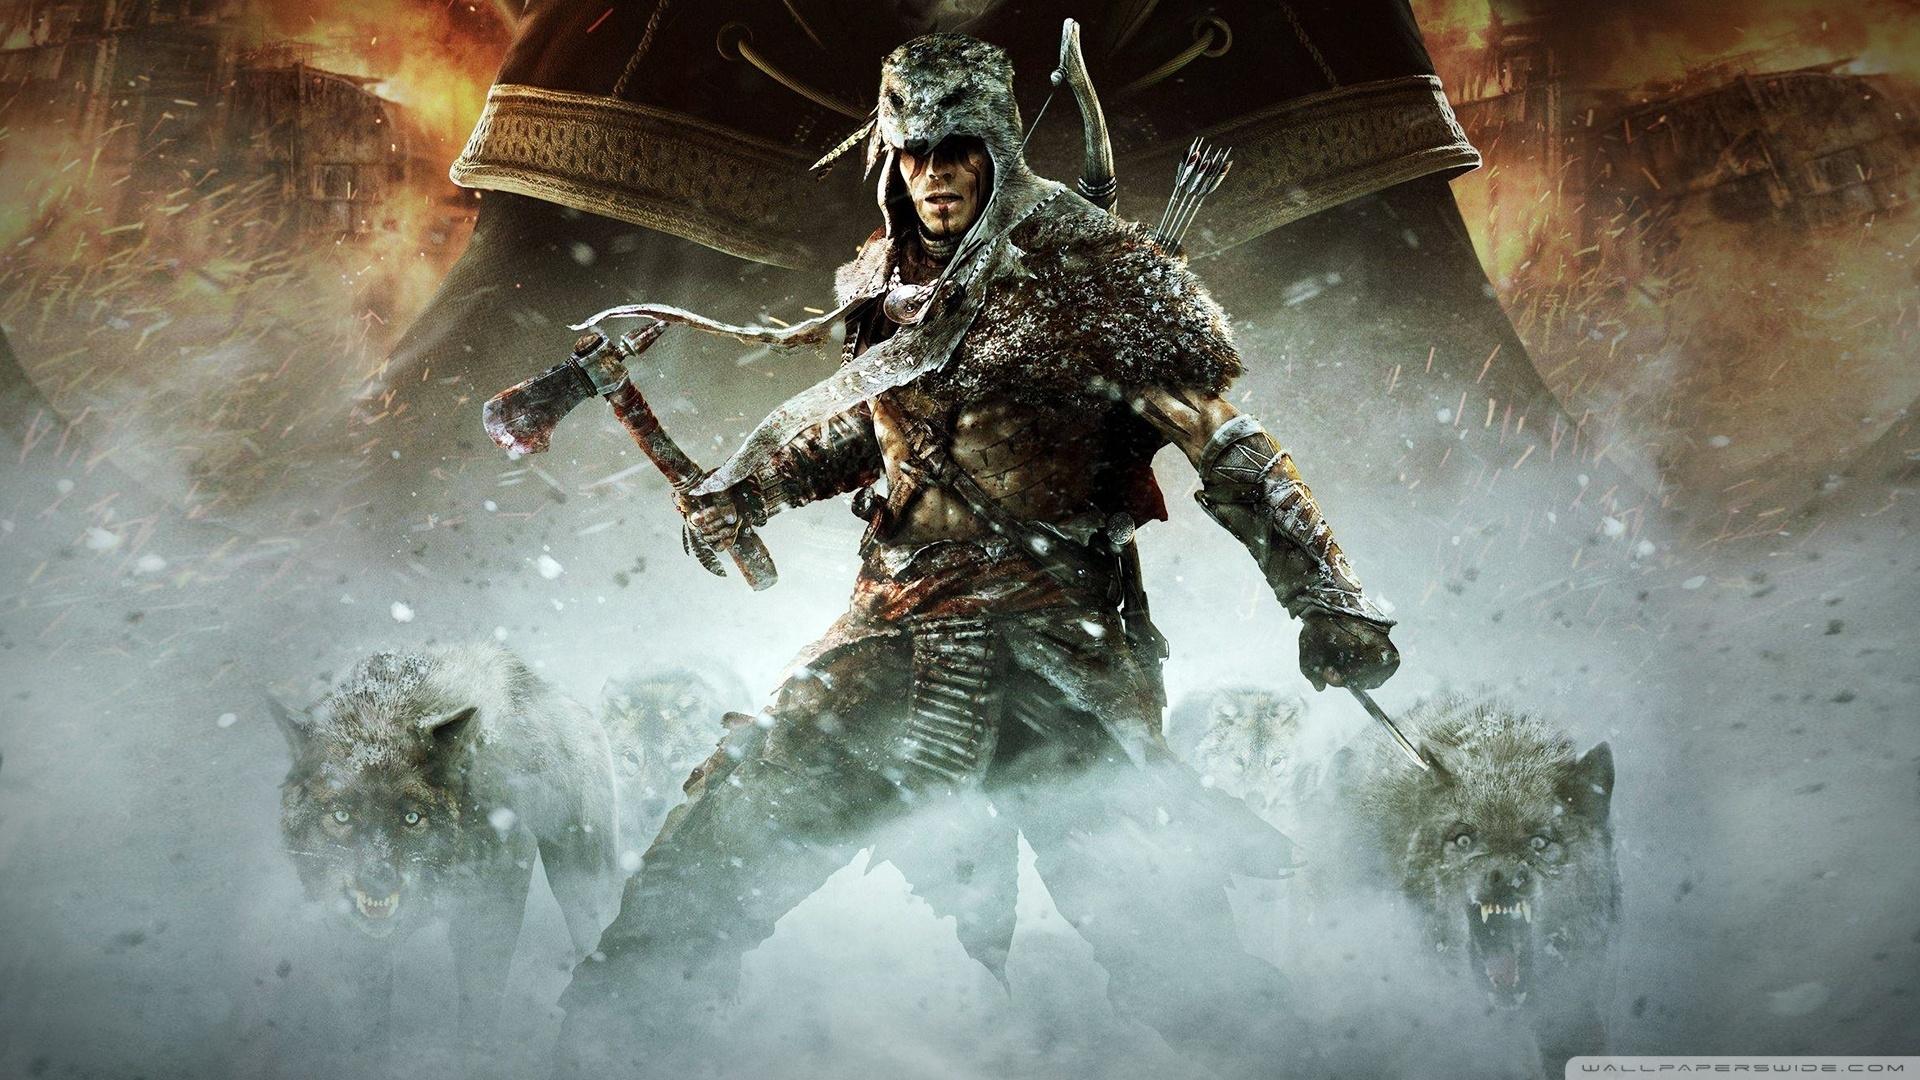 assassins creed iii the tyranny of king washington ❤ 4k hd desktop